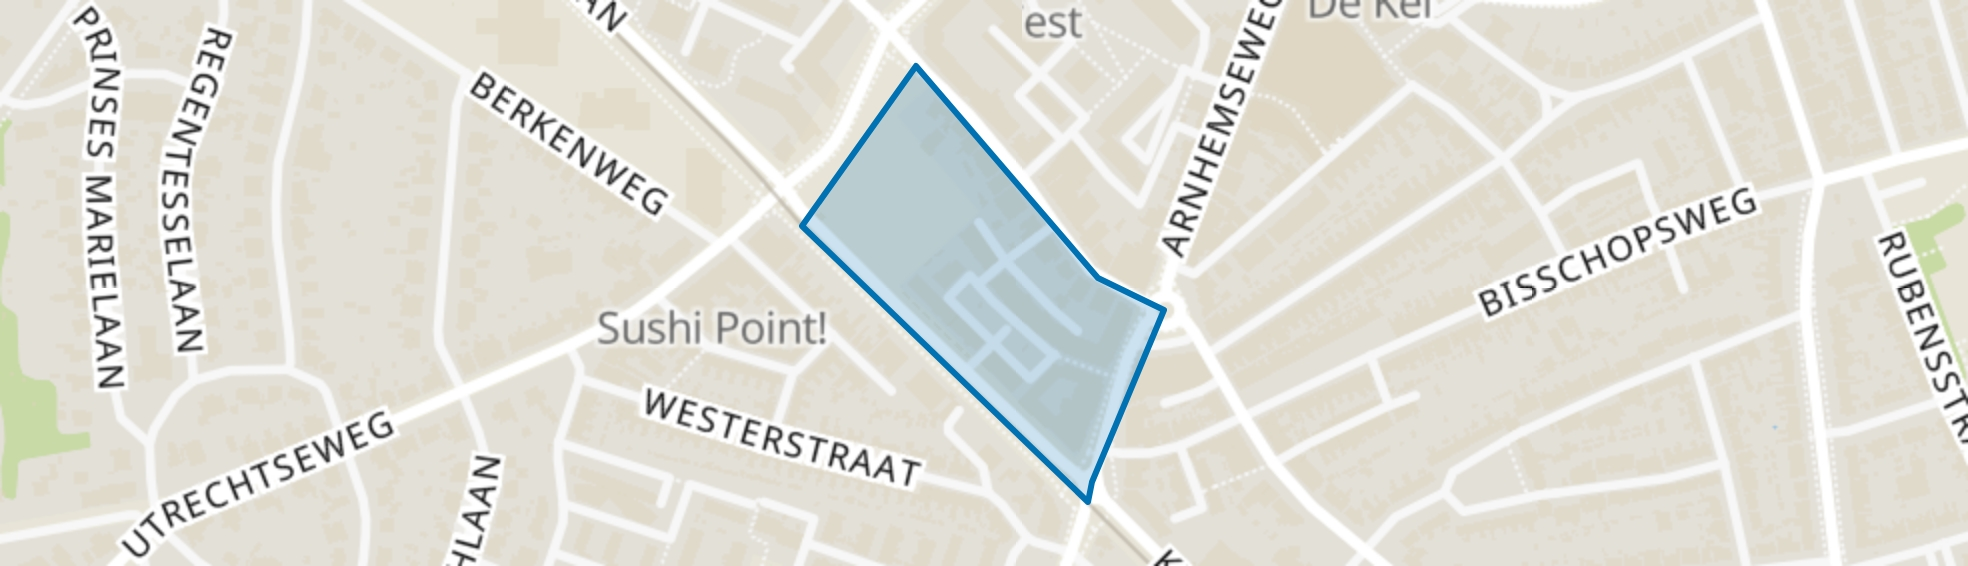 Weltevreden, Amersfoort map